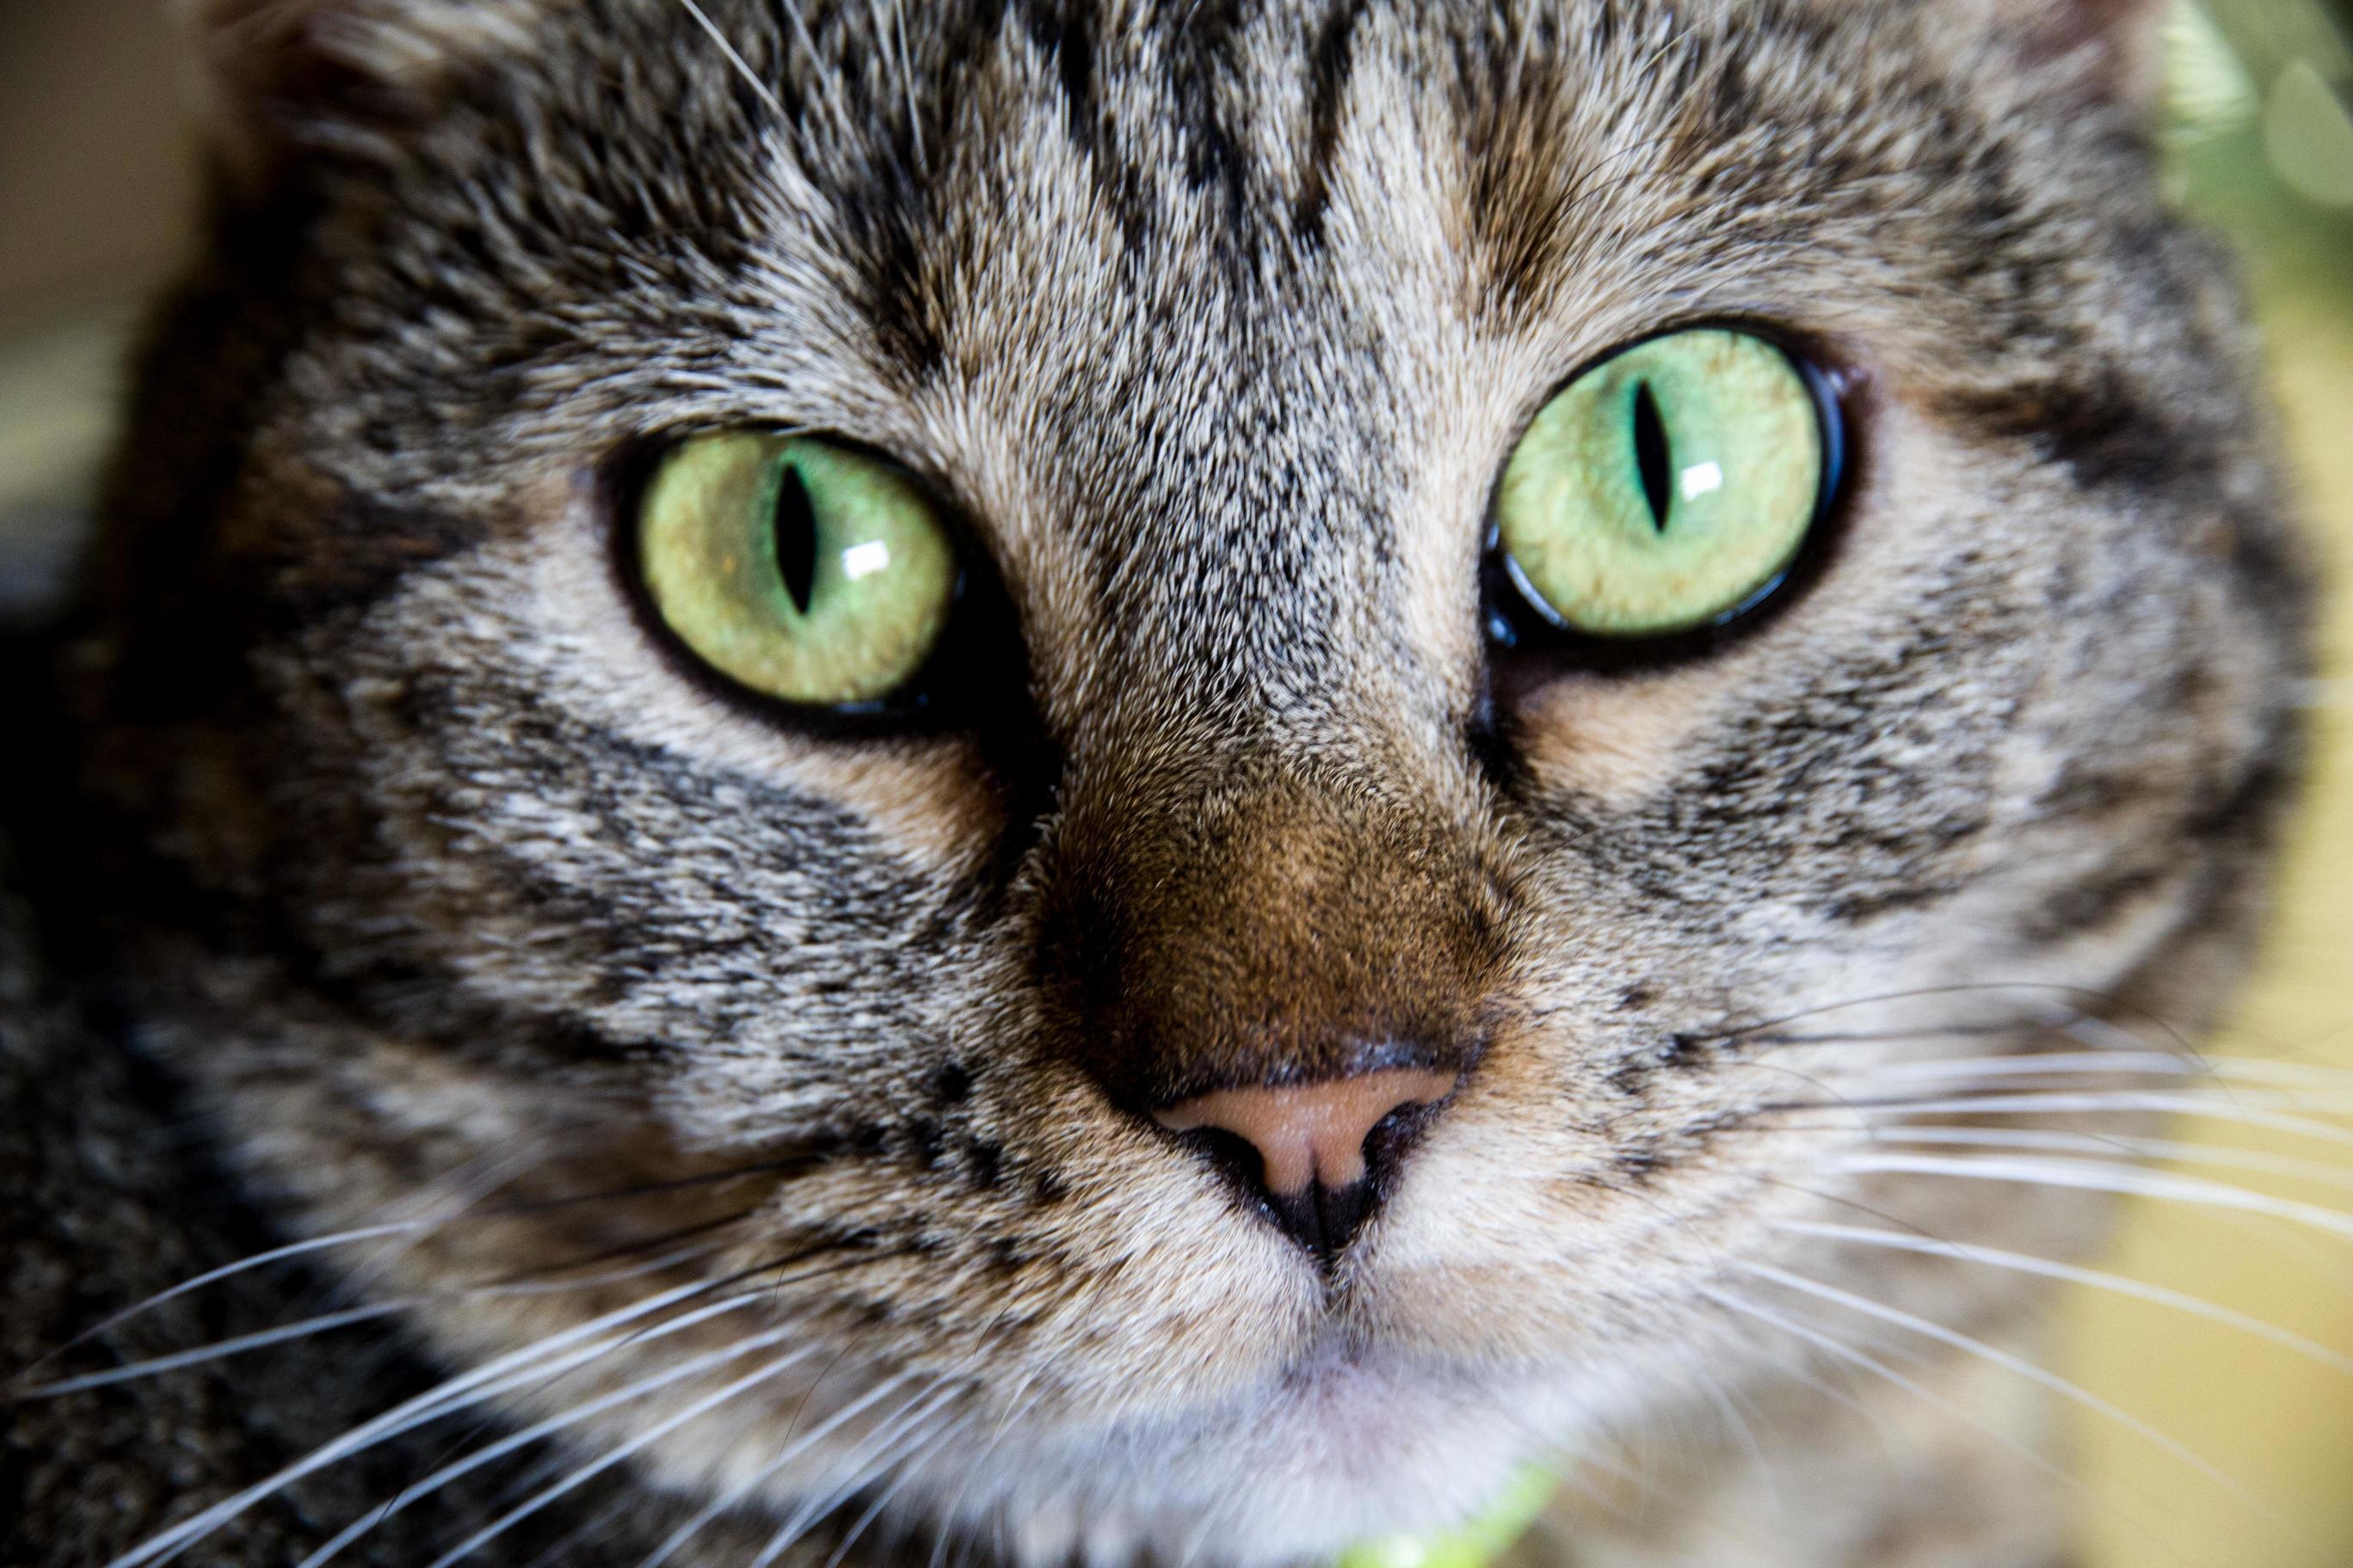 Green eyed beauty.